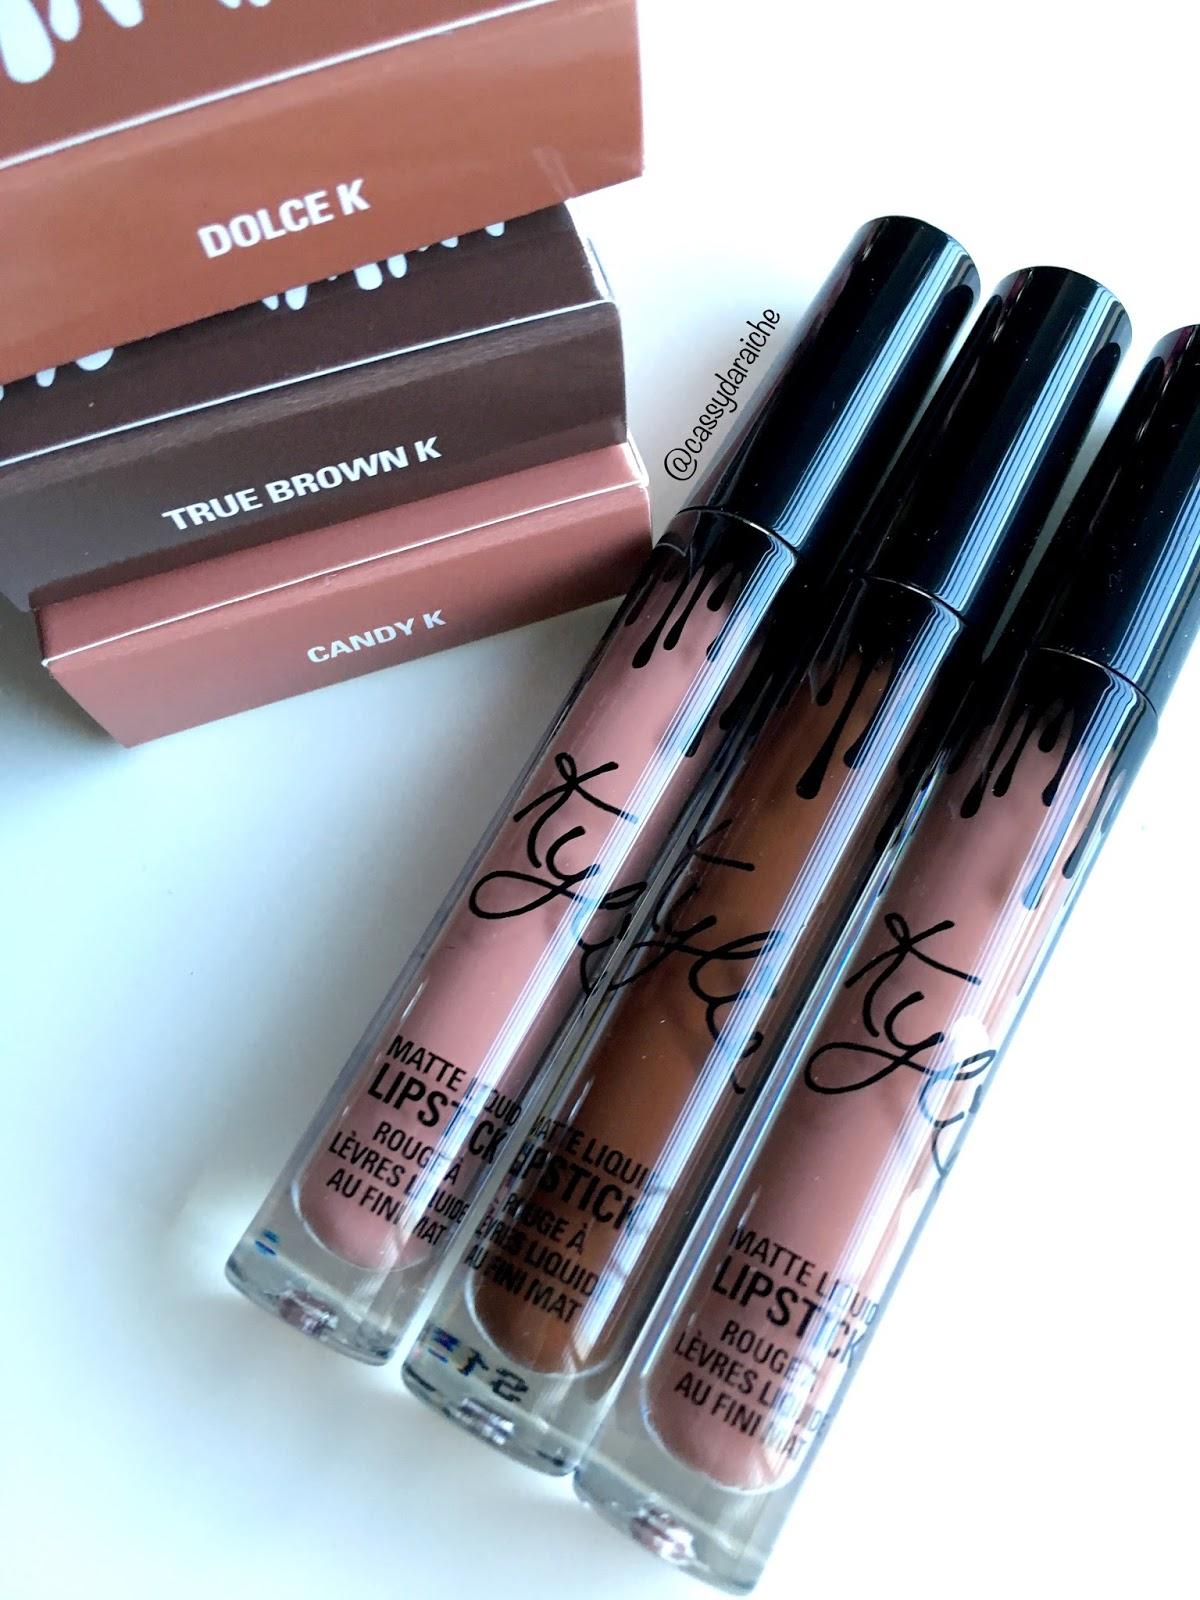 Cassy's Life In Lipstick: Kylie Jenner Dolce K Liquid Lipstick